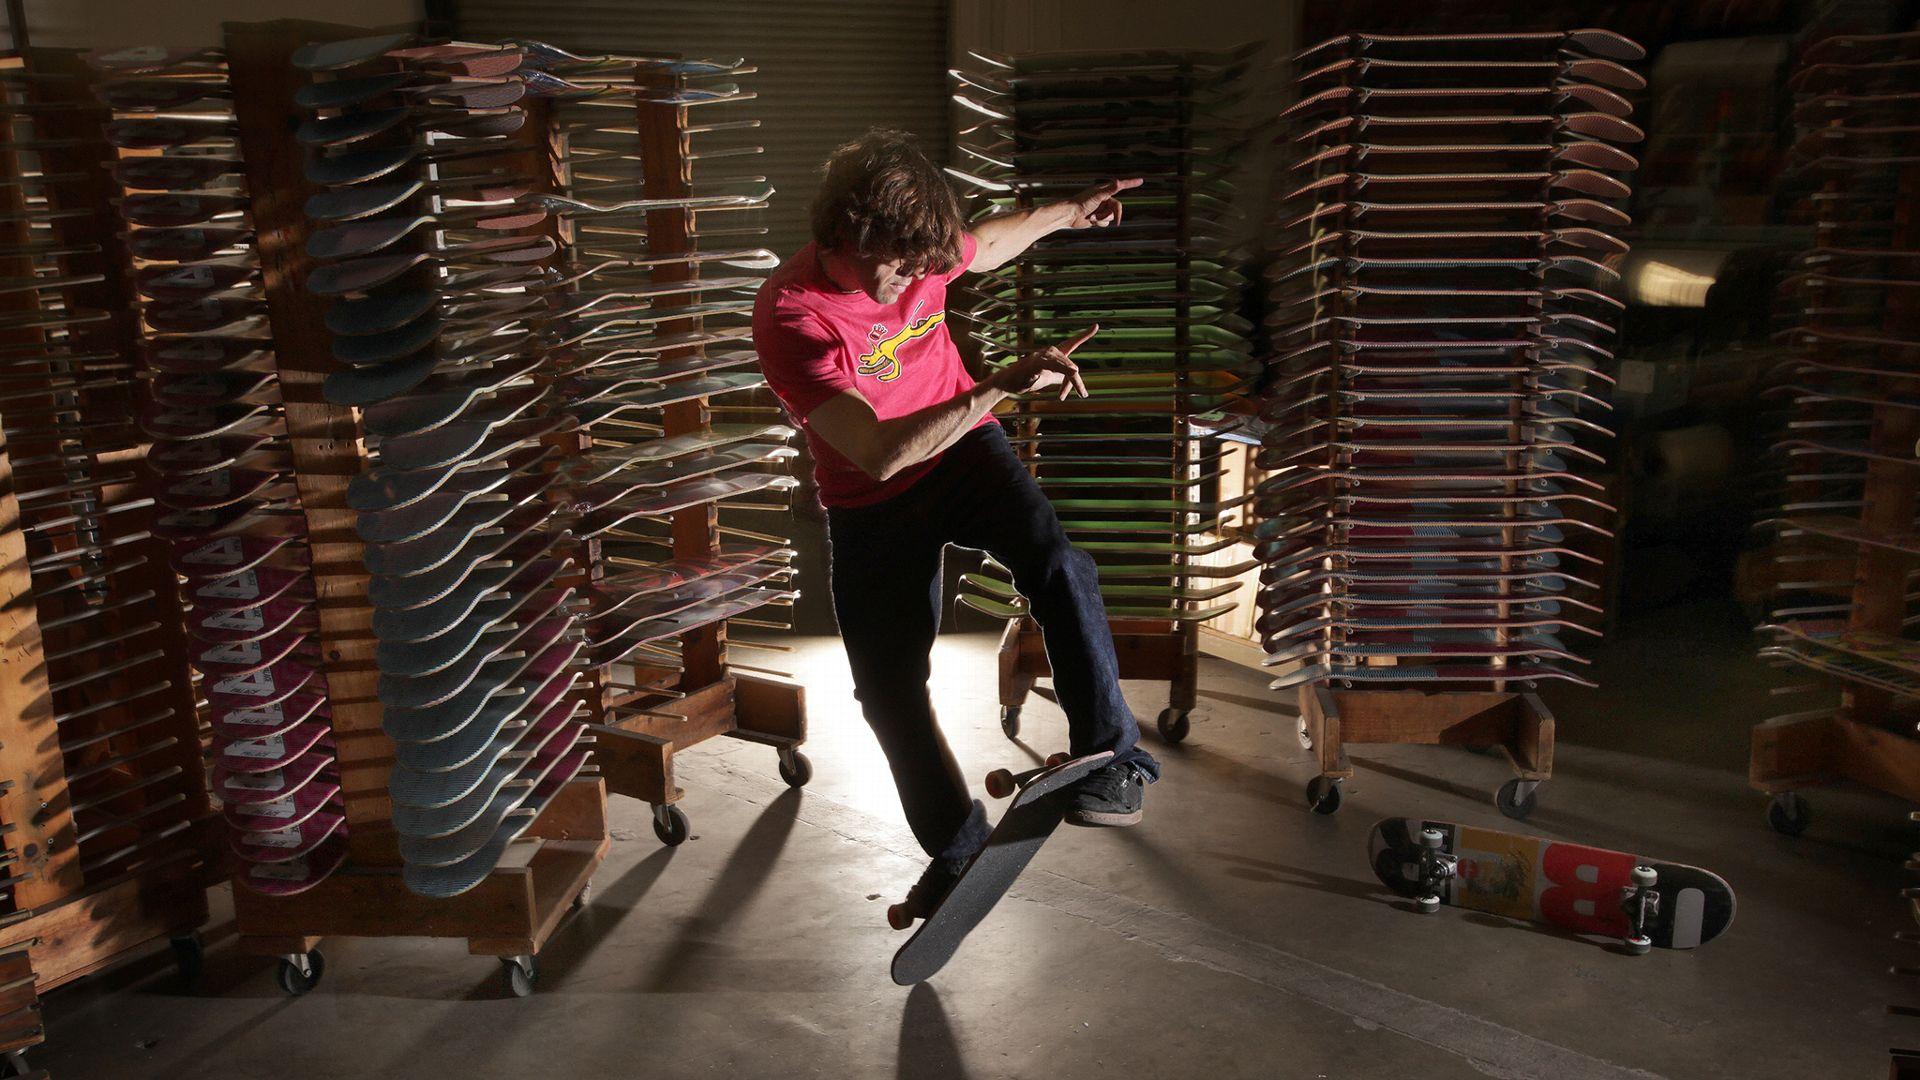 New skateboarding tricks from RODNEY MULLEN